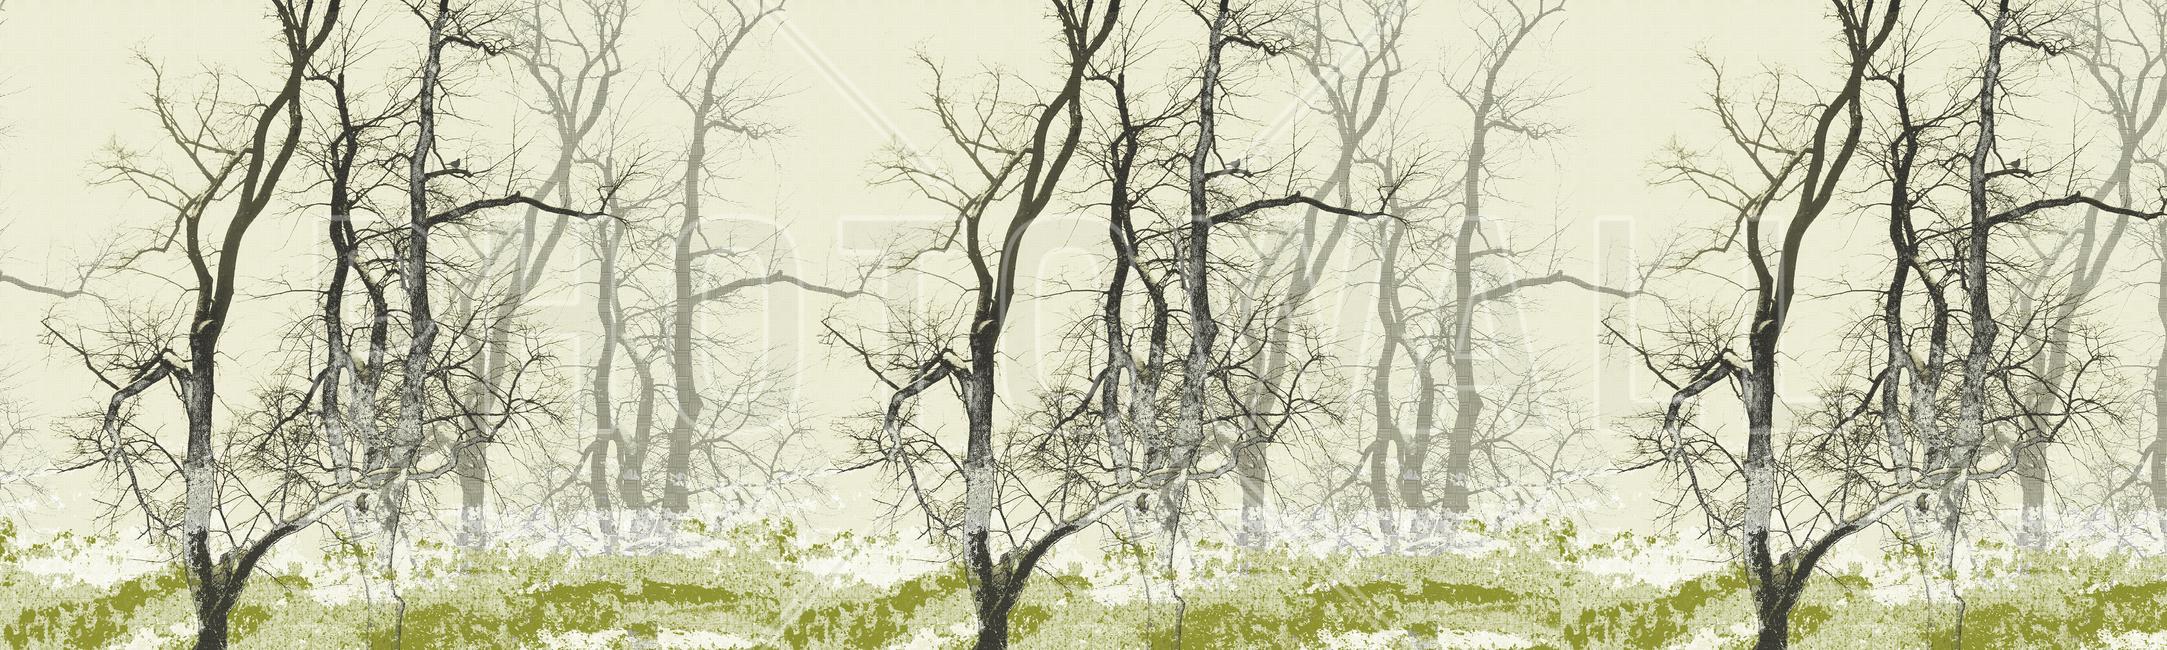 Kuva Wander Land Moss Tapetit / tapetti 100 x 100 cm